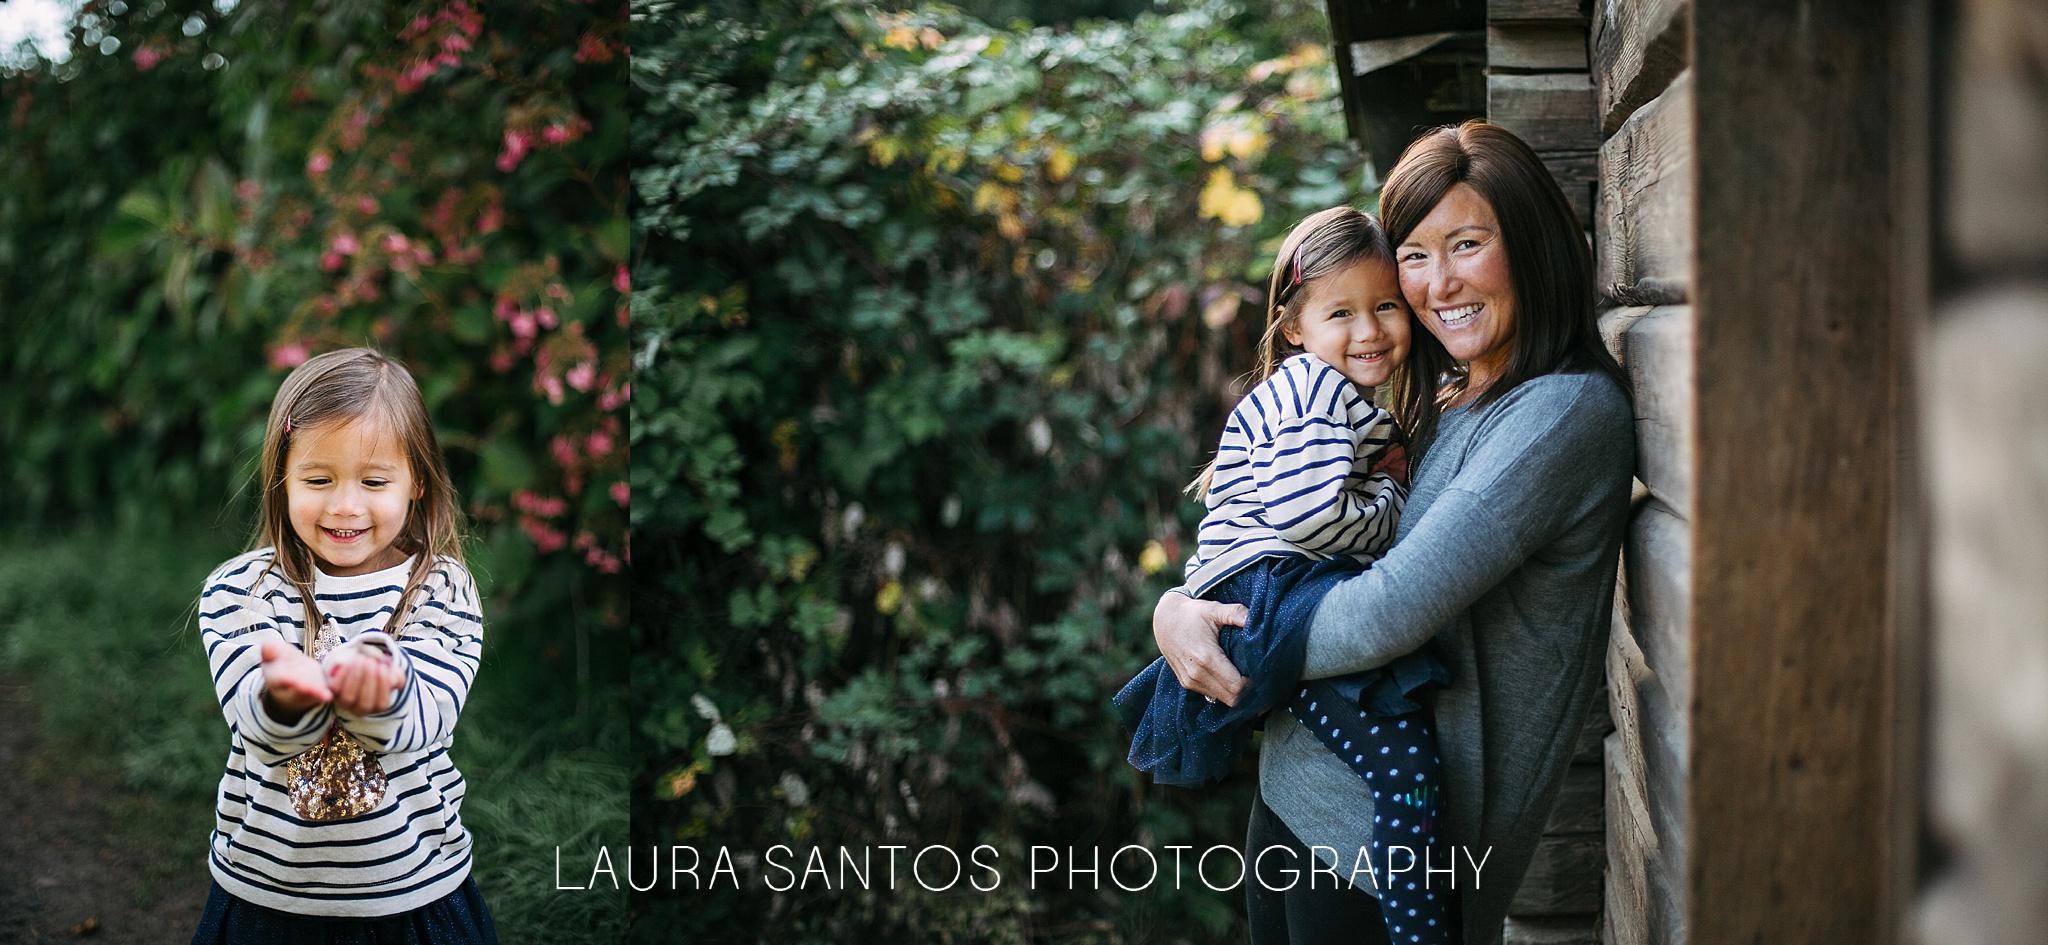 Laura Santos Photography Portland Oregon Family Photographer_0536.jpg